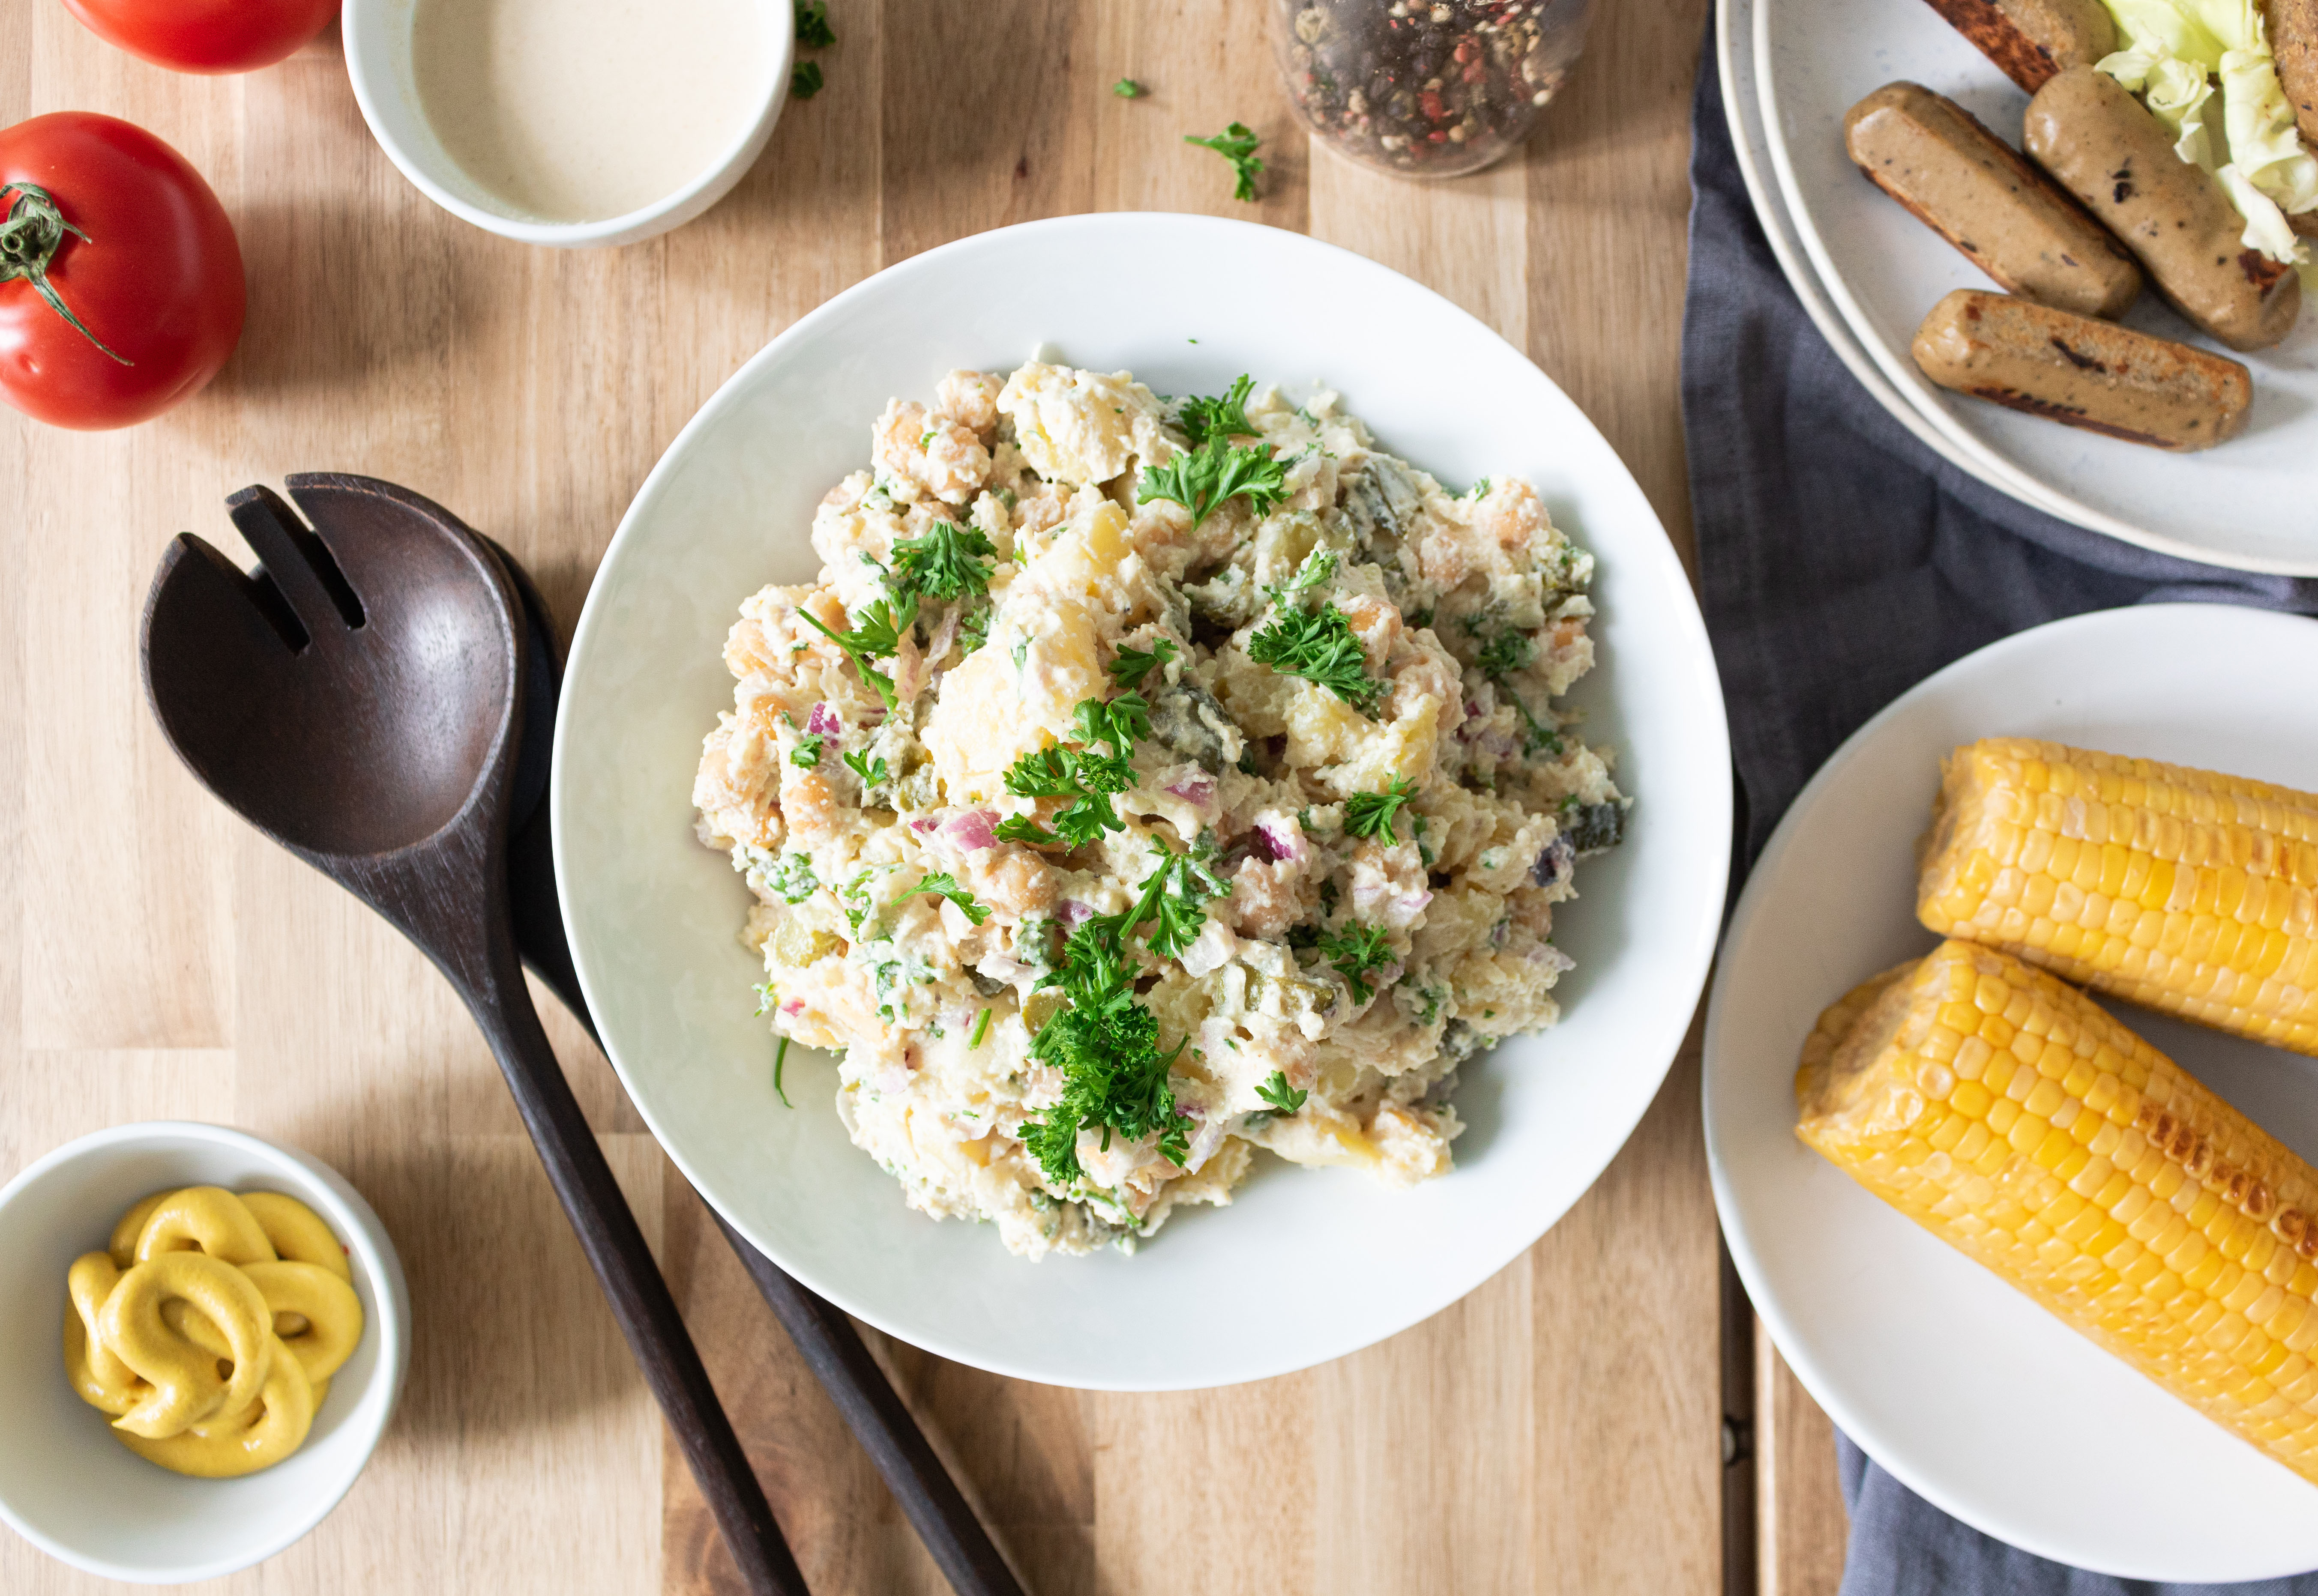 Insalata di patate con maionese vegana